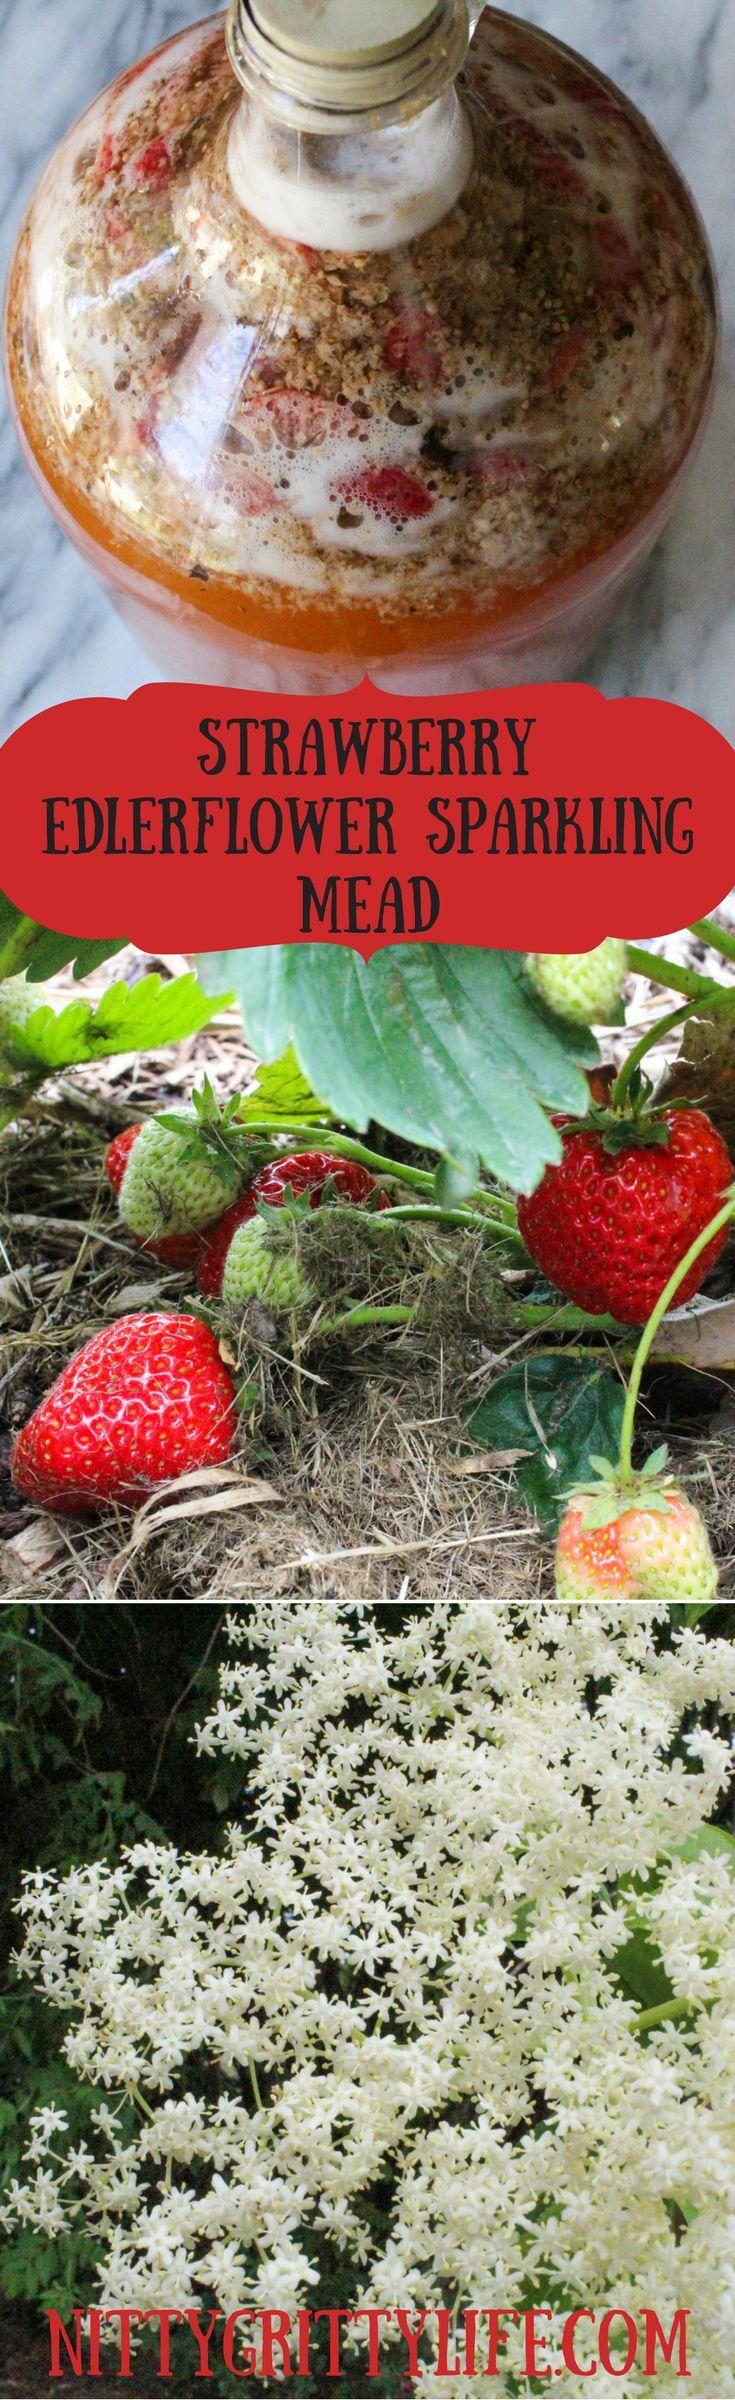 Strawberry Elderflower Sparkling Mead Recipe Elderflower Mead Mead Recipe